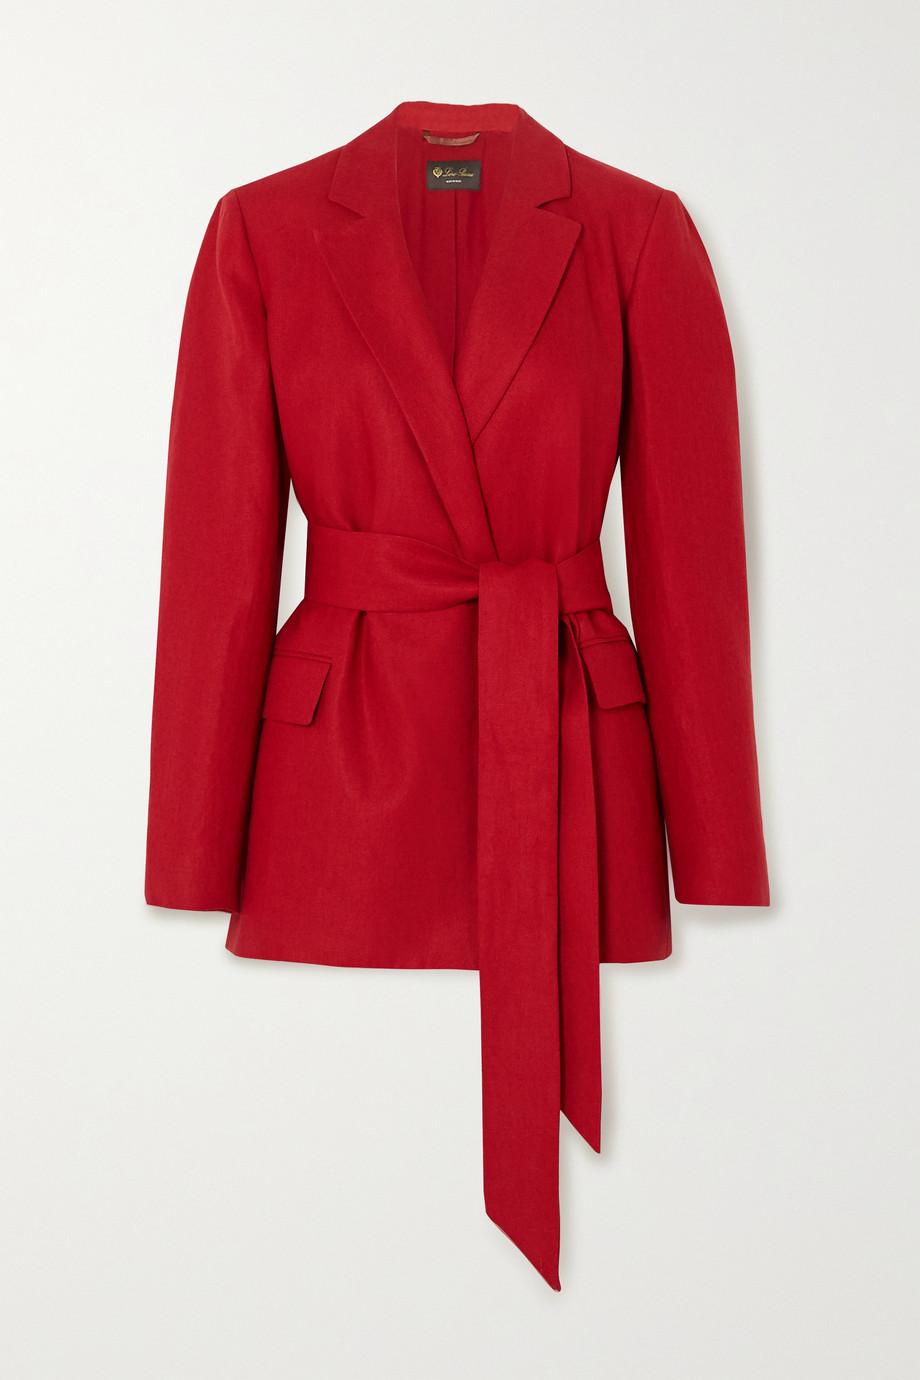 Loro Piana Belted linen blazer